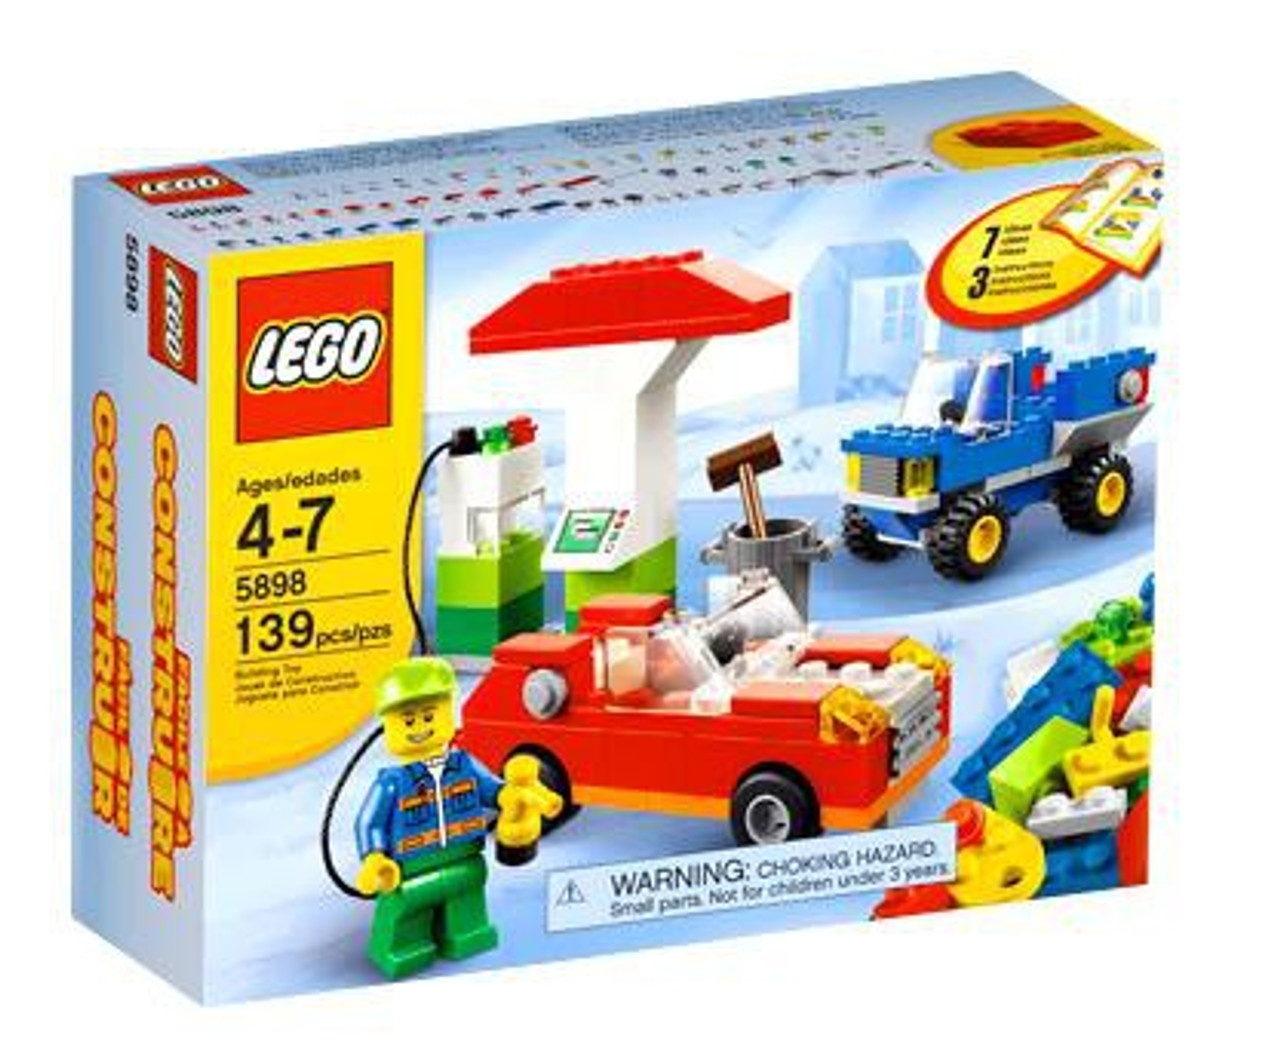 LEGO Cars Building Set #5898